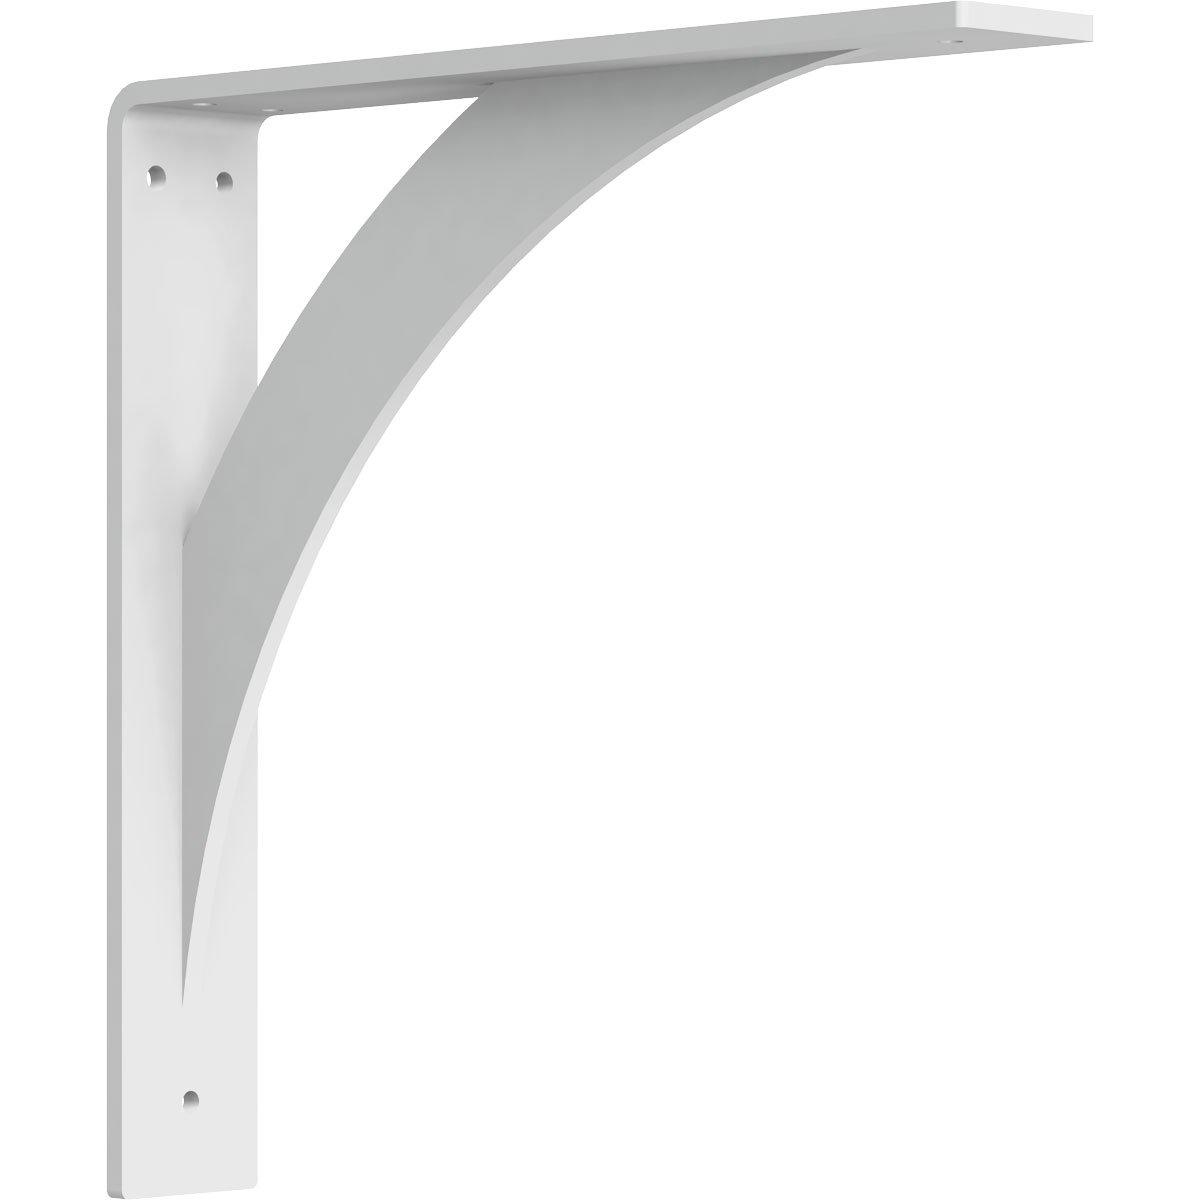 Tools Home Improvement Building Supplies Ekena Millwork Bktm02x20x20lehsv 2 W D X 20 H Legacy Steel Bracket Hammered Silver 2 Wx 20 Dx 20 Theamalfiexperience Com